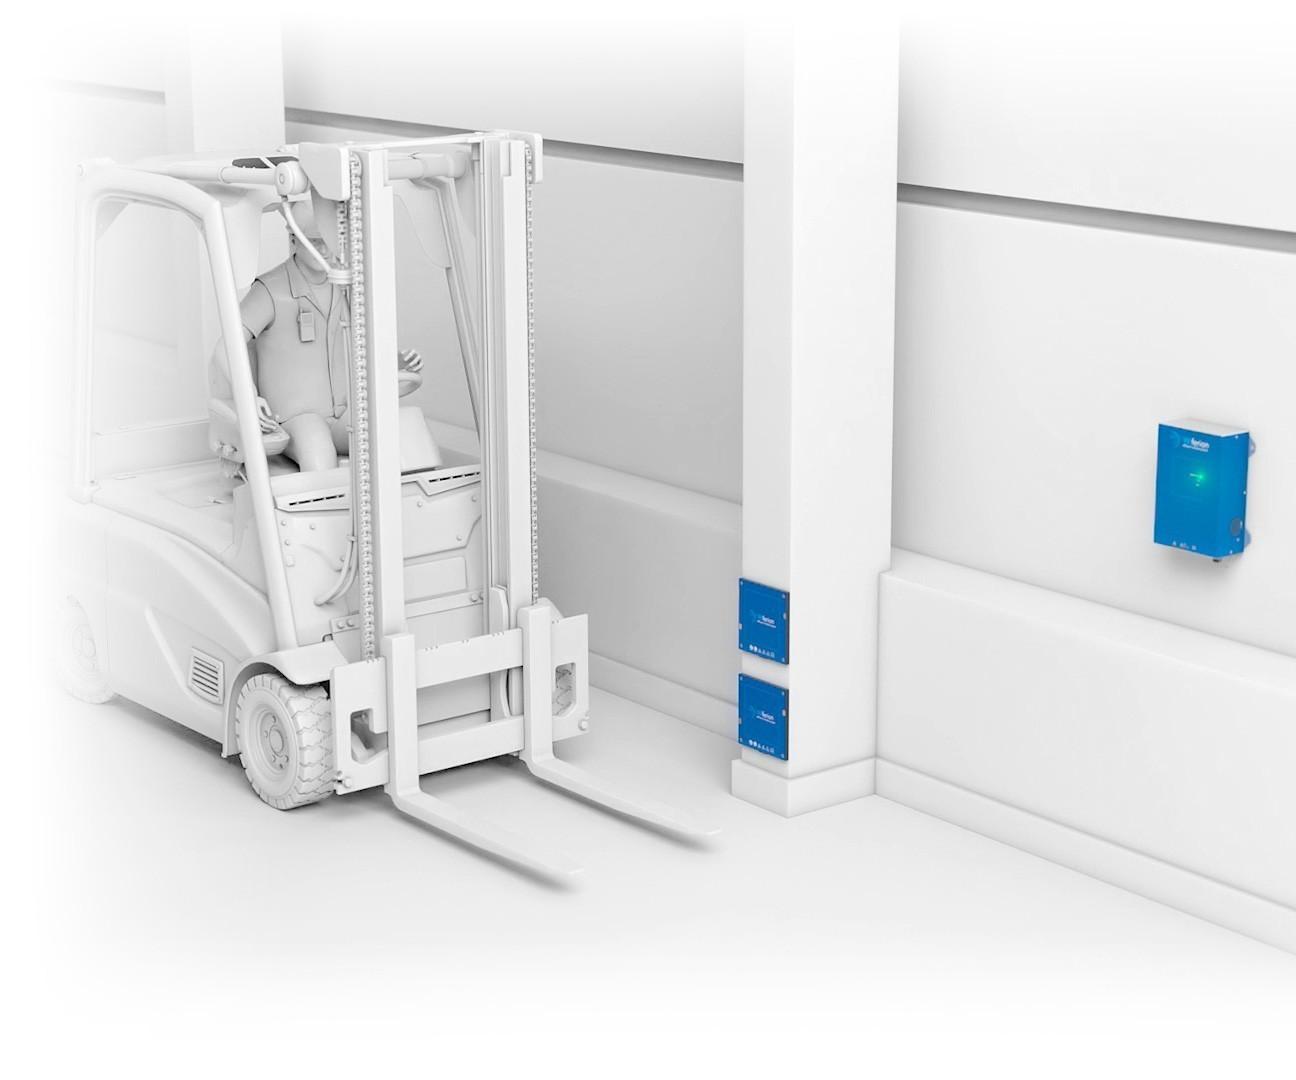 installation vertikal - wireless charging forklift installation